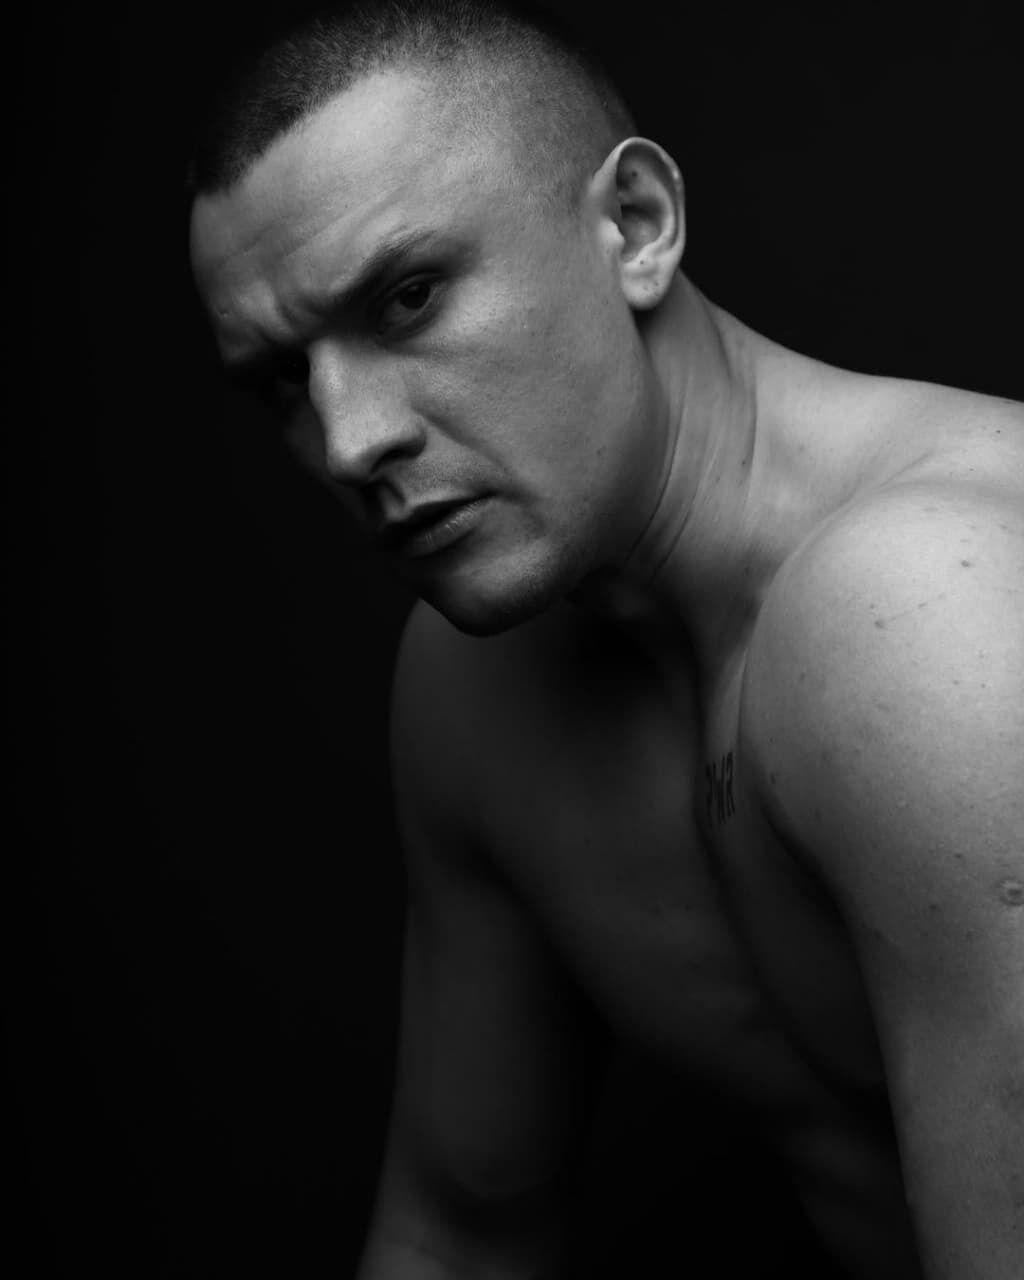 Тарас Цимбалюк снялся в фотосессии.